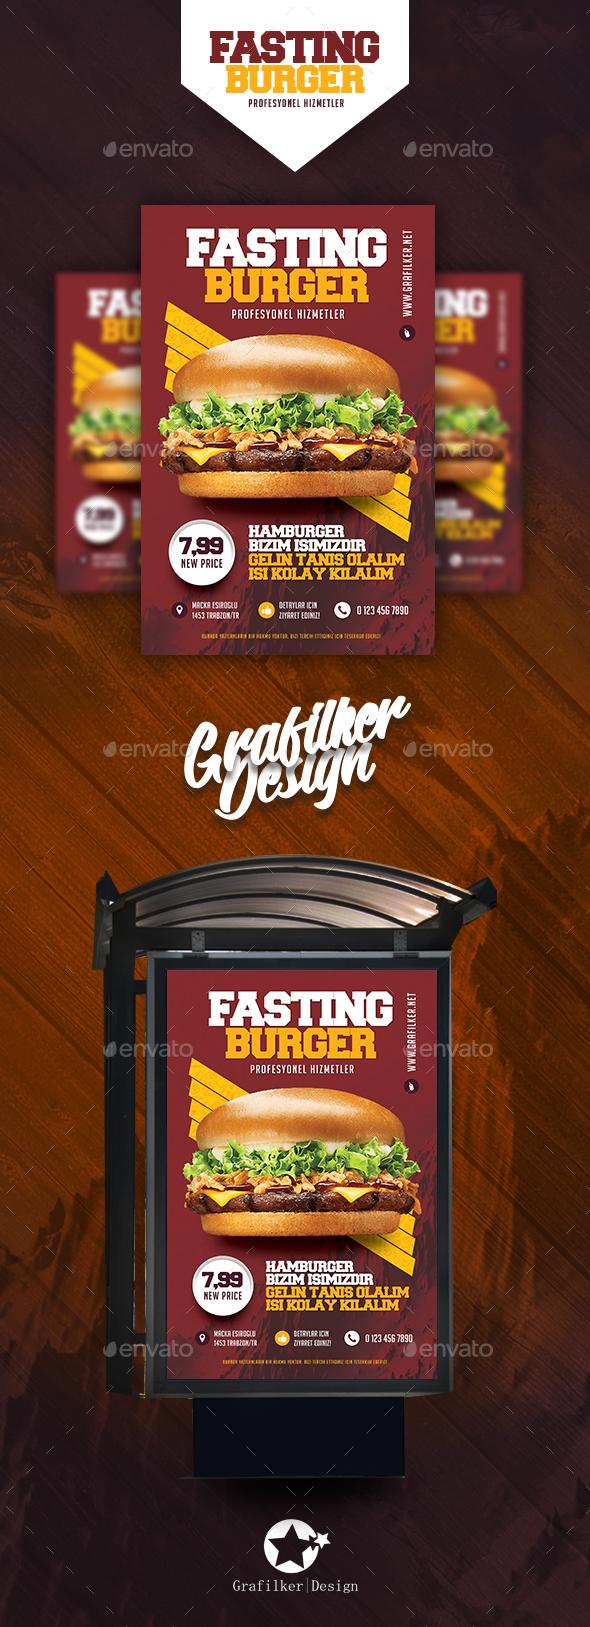 Fast Food Burger Poster Templates - Signage Print Templates